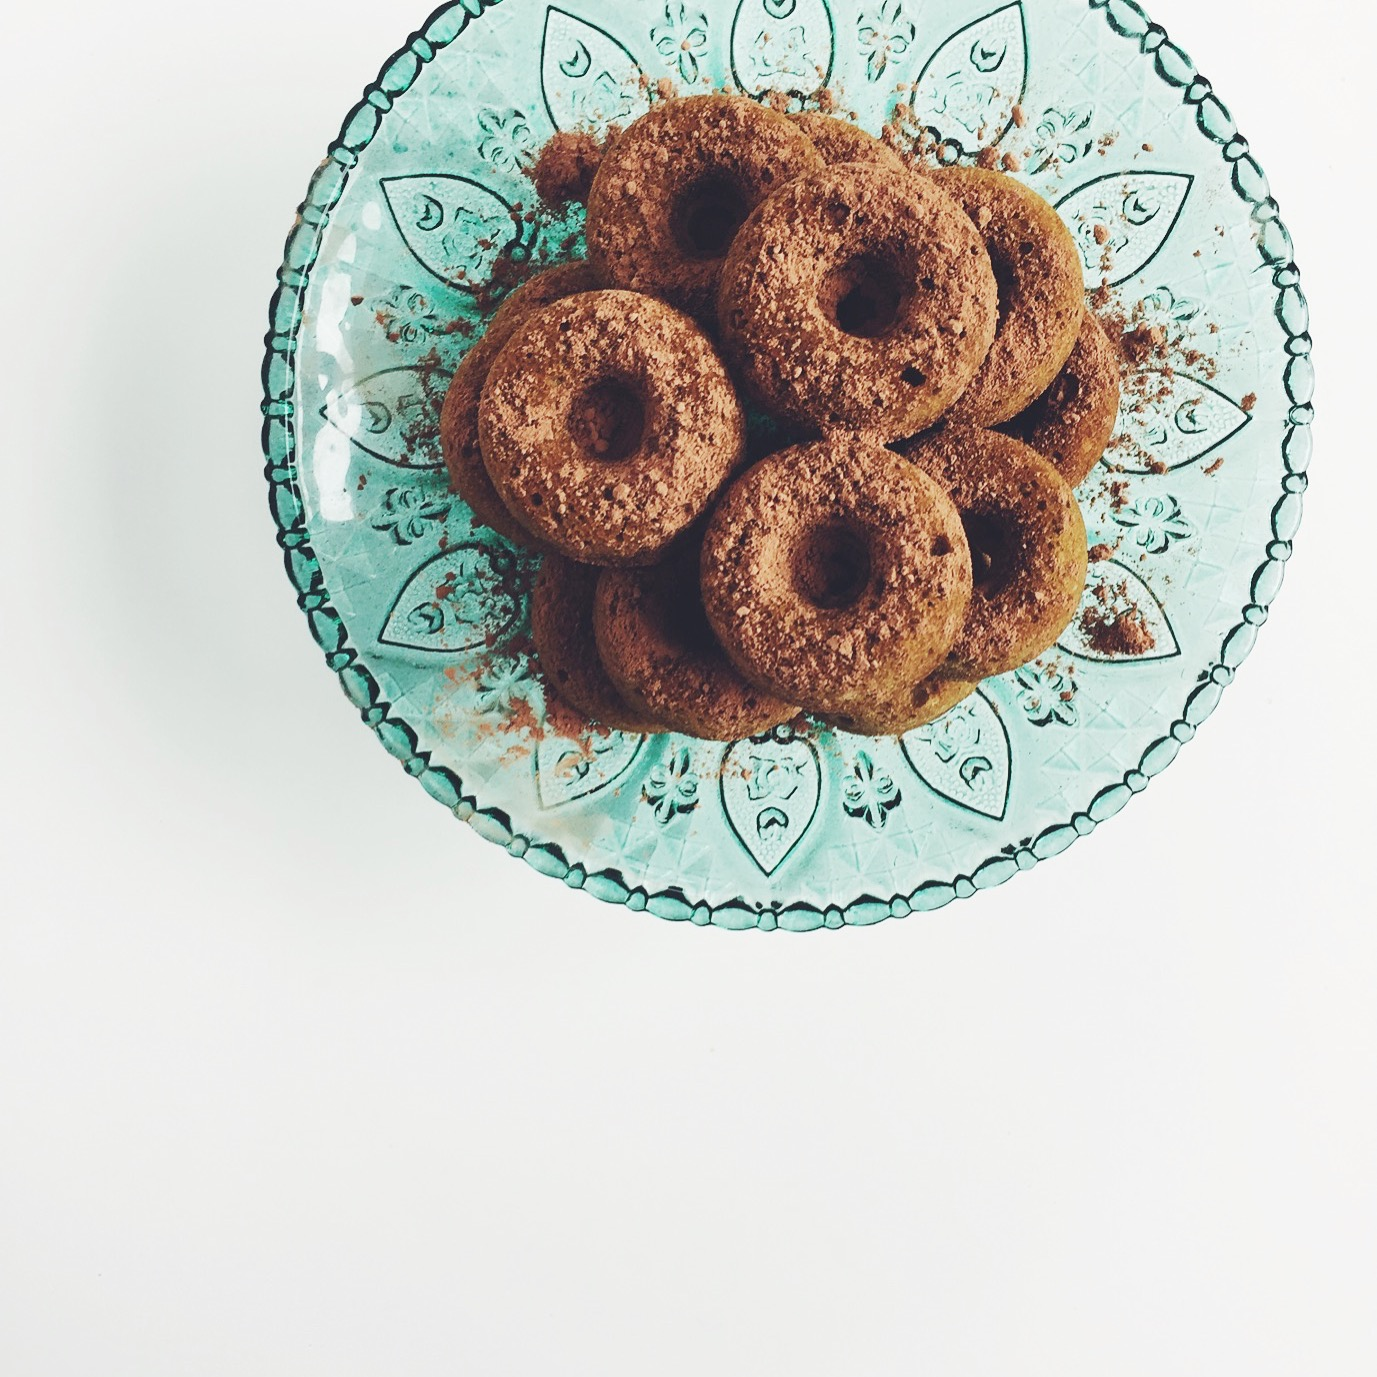 Mini matcha doughnuts (GF) via @simplyrealhealth